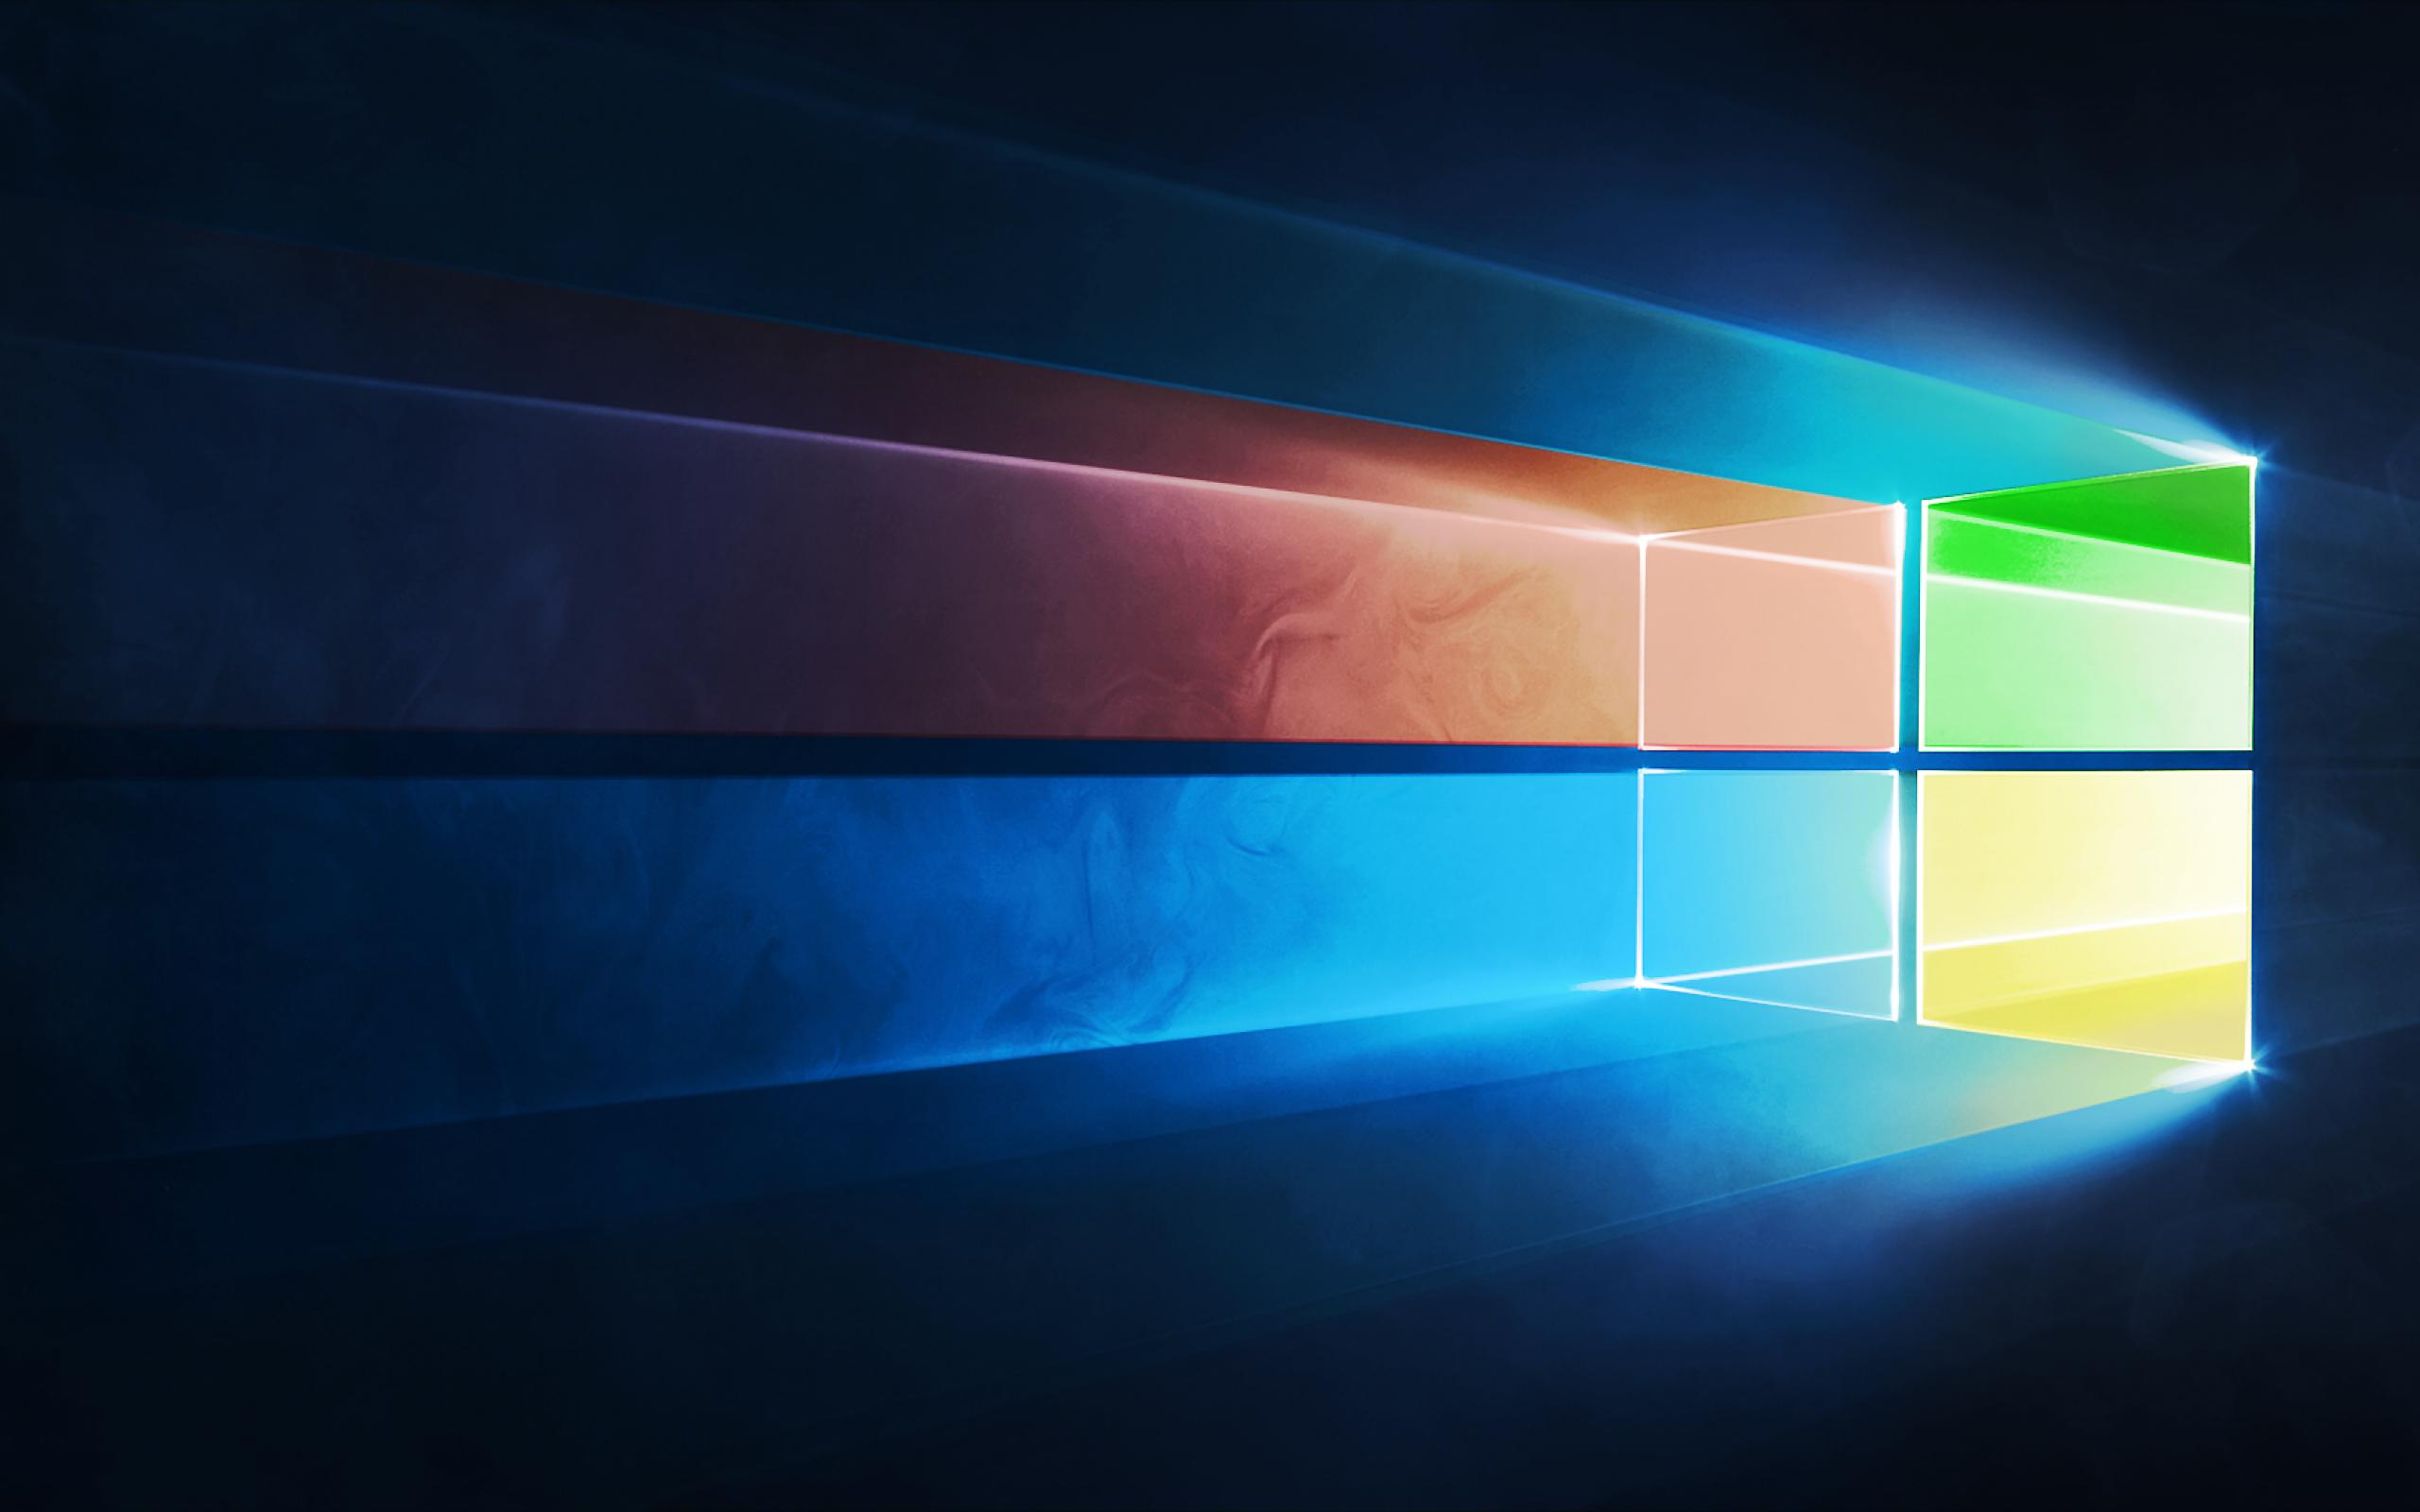 57 Windows 10 高清壁纸 桌面背景 Wallpaper Abyss